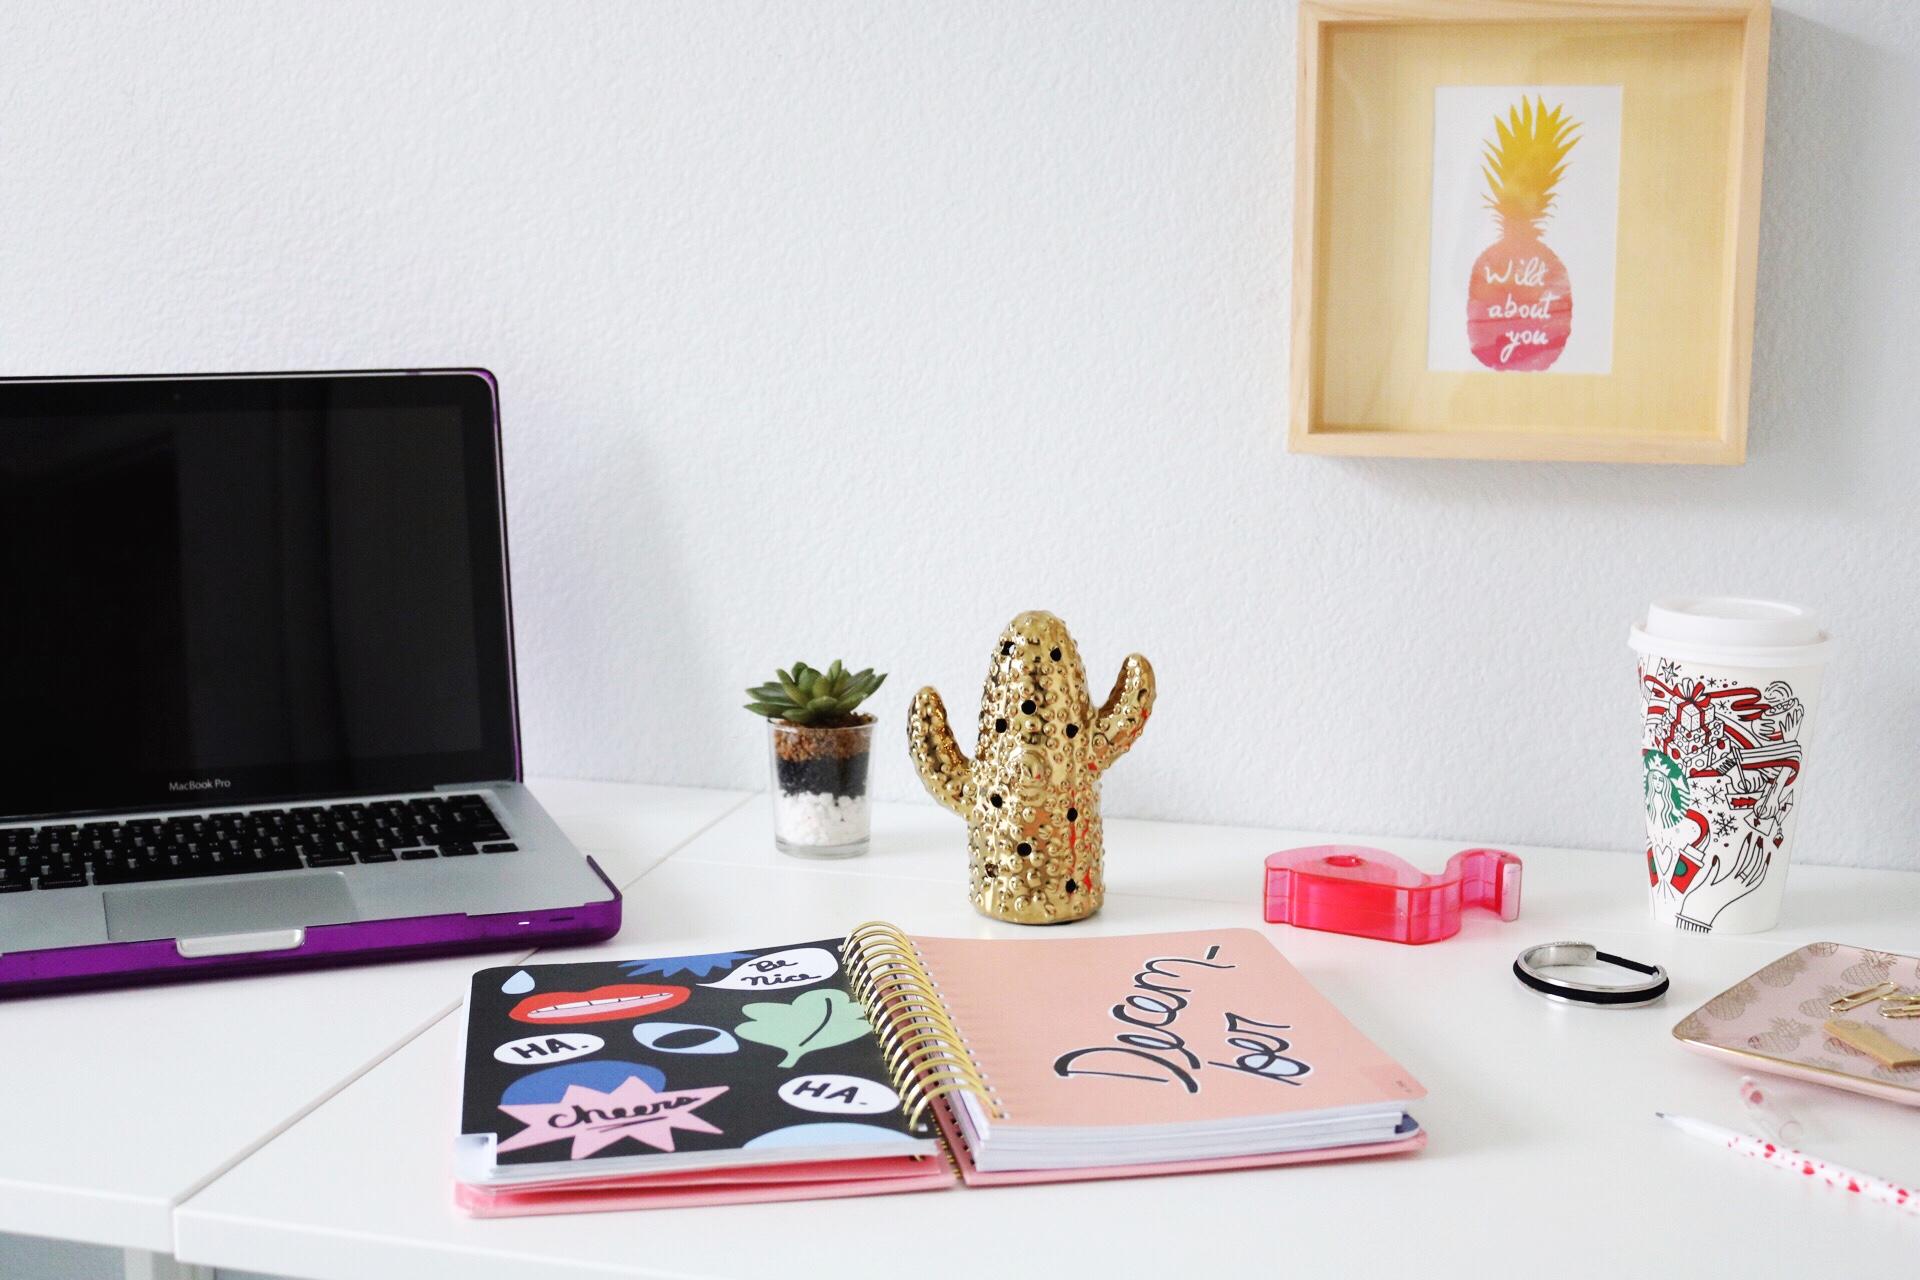 MacBook Pro Bando Planner flamingo tape dispenser gold cactus statue pineapple framed photo